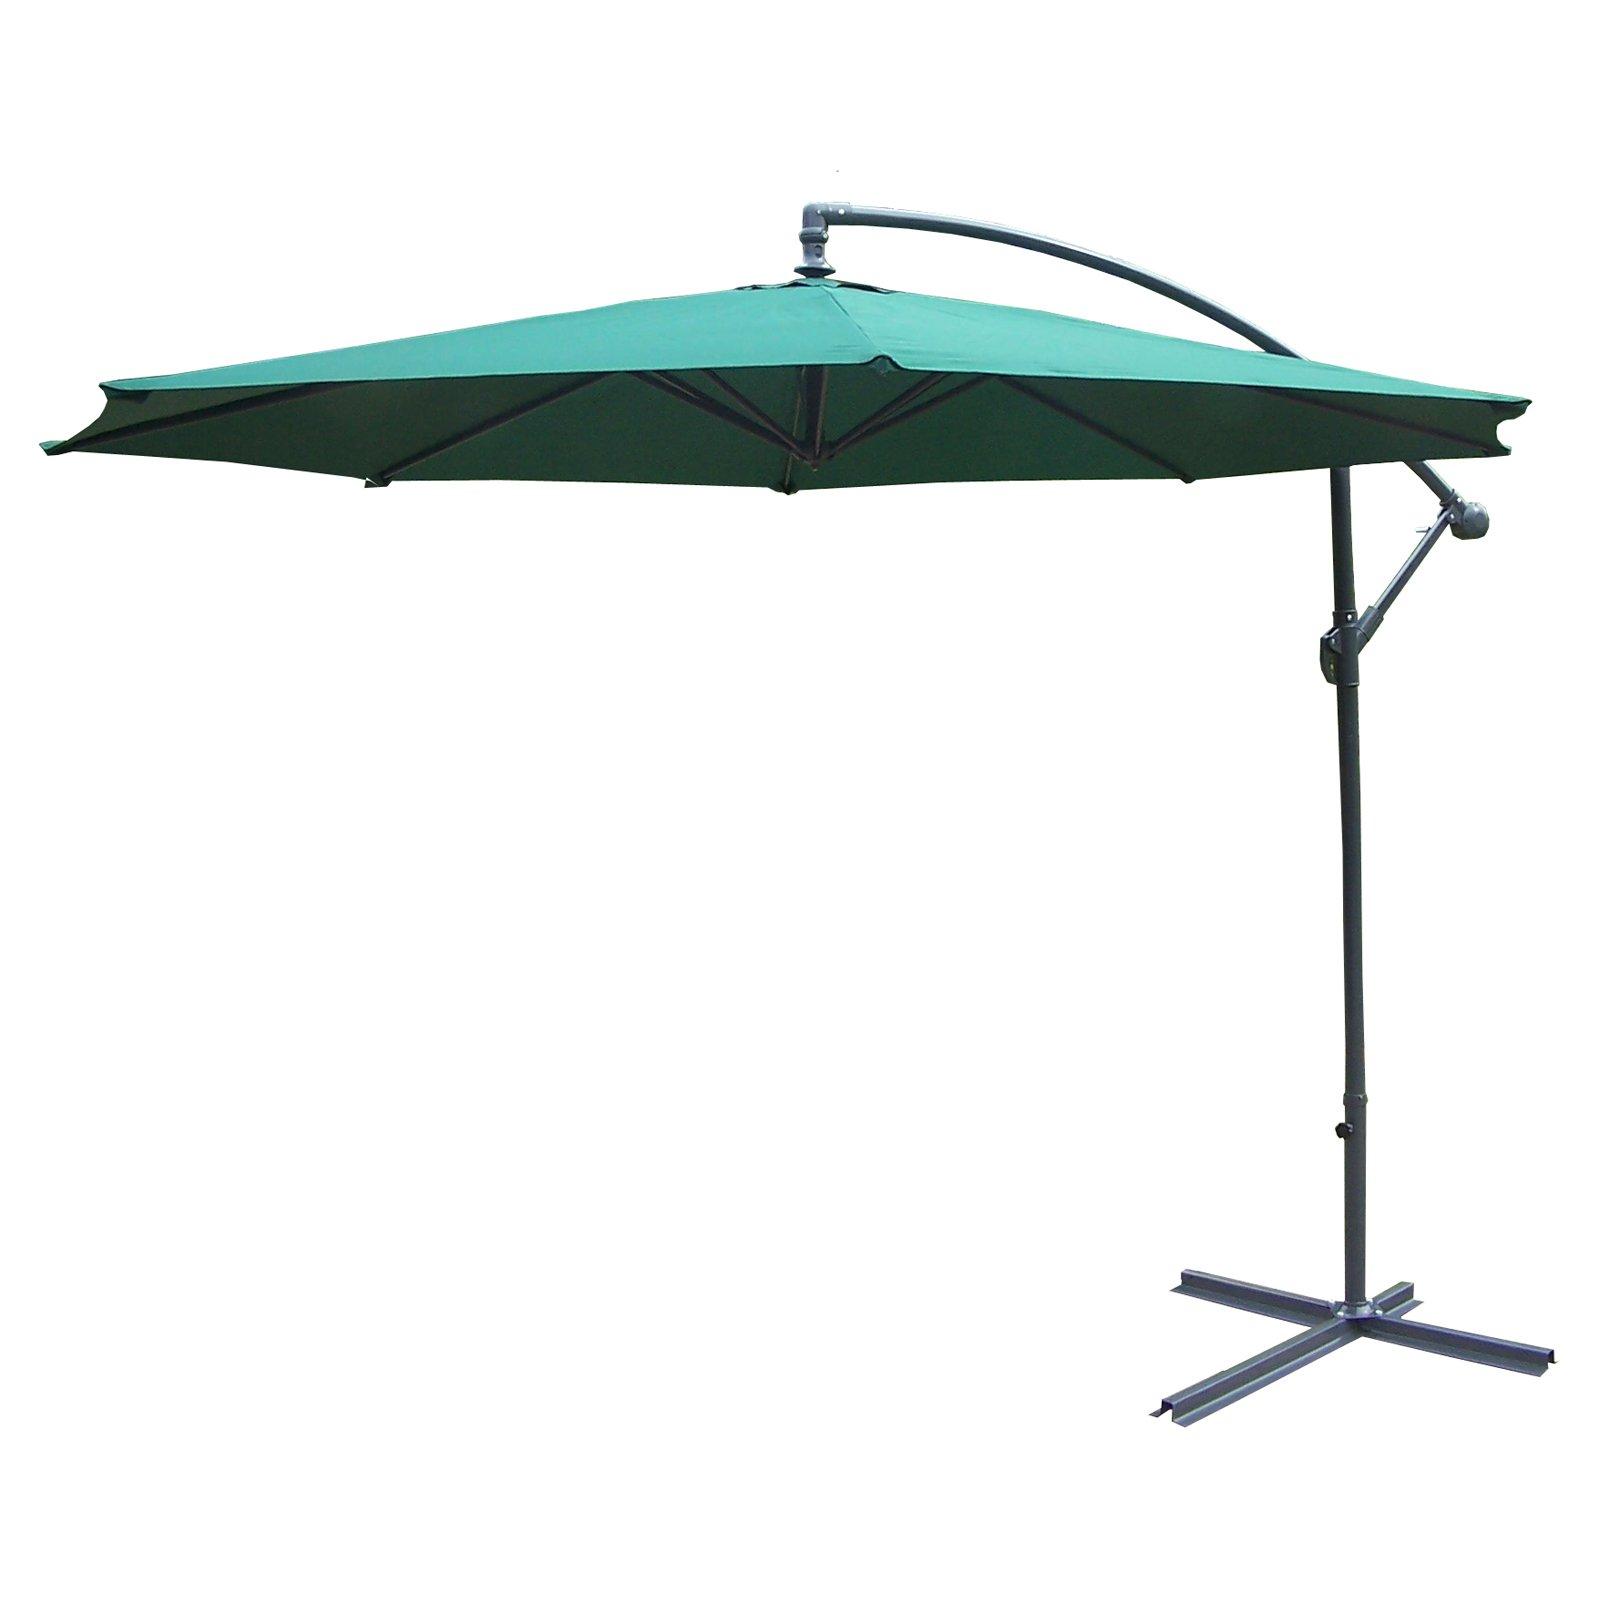 Oakland Living 10 ft. Cantilever Umbrella with Cast Polyr...